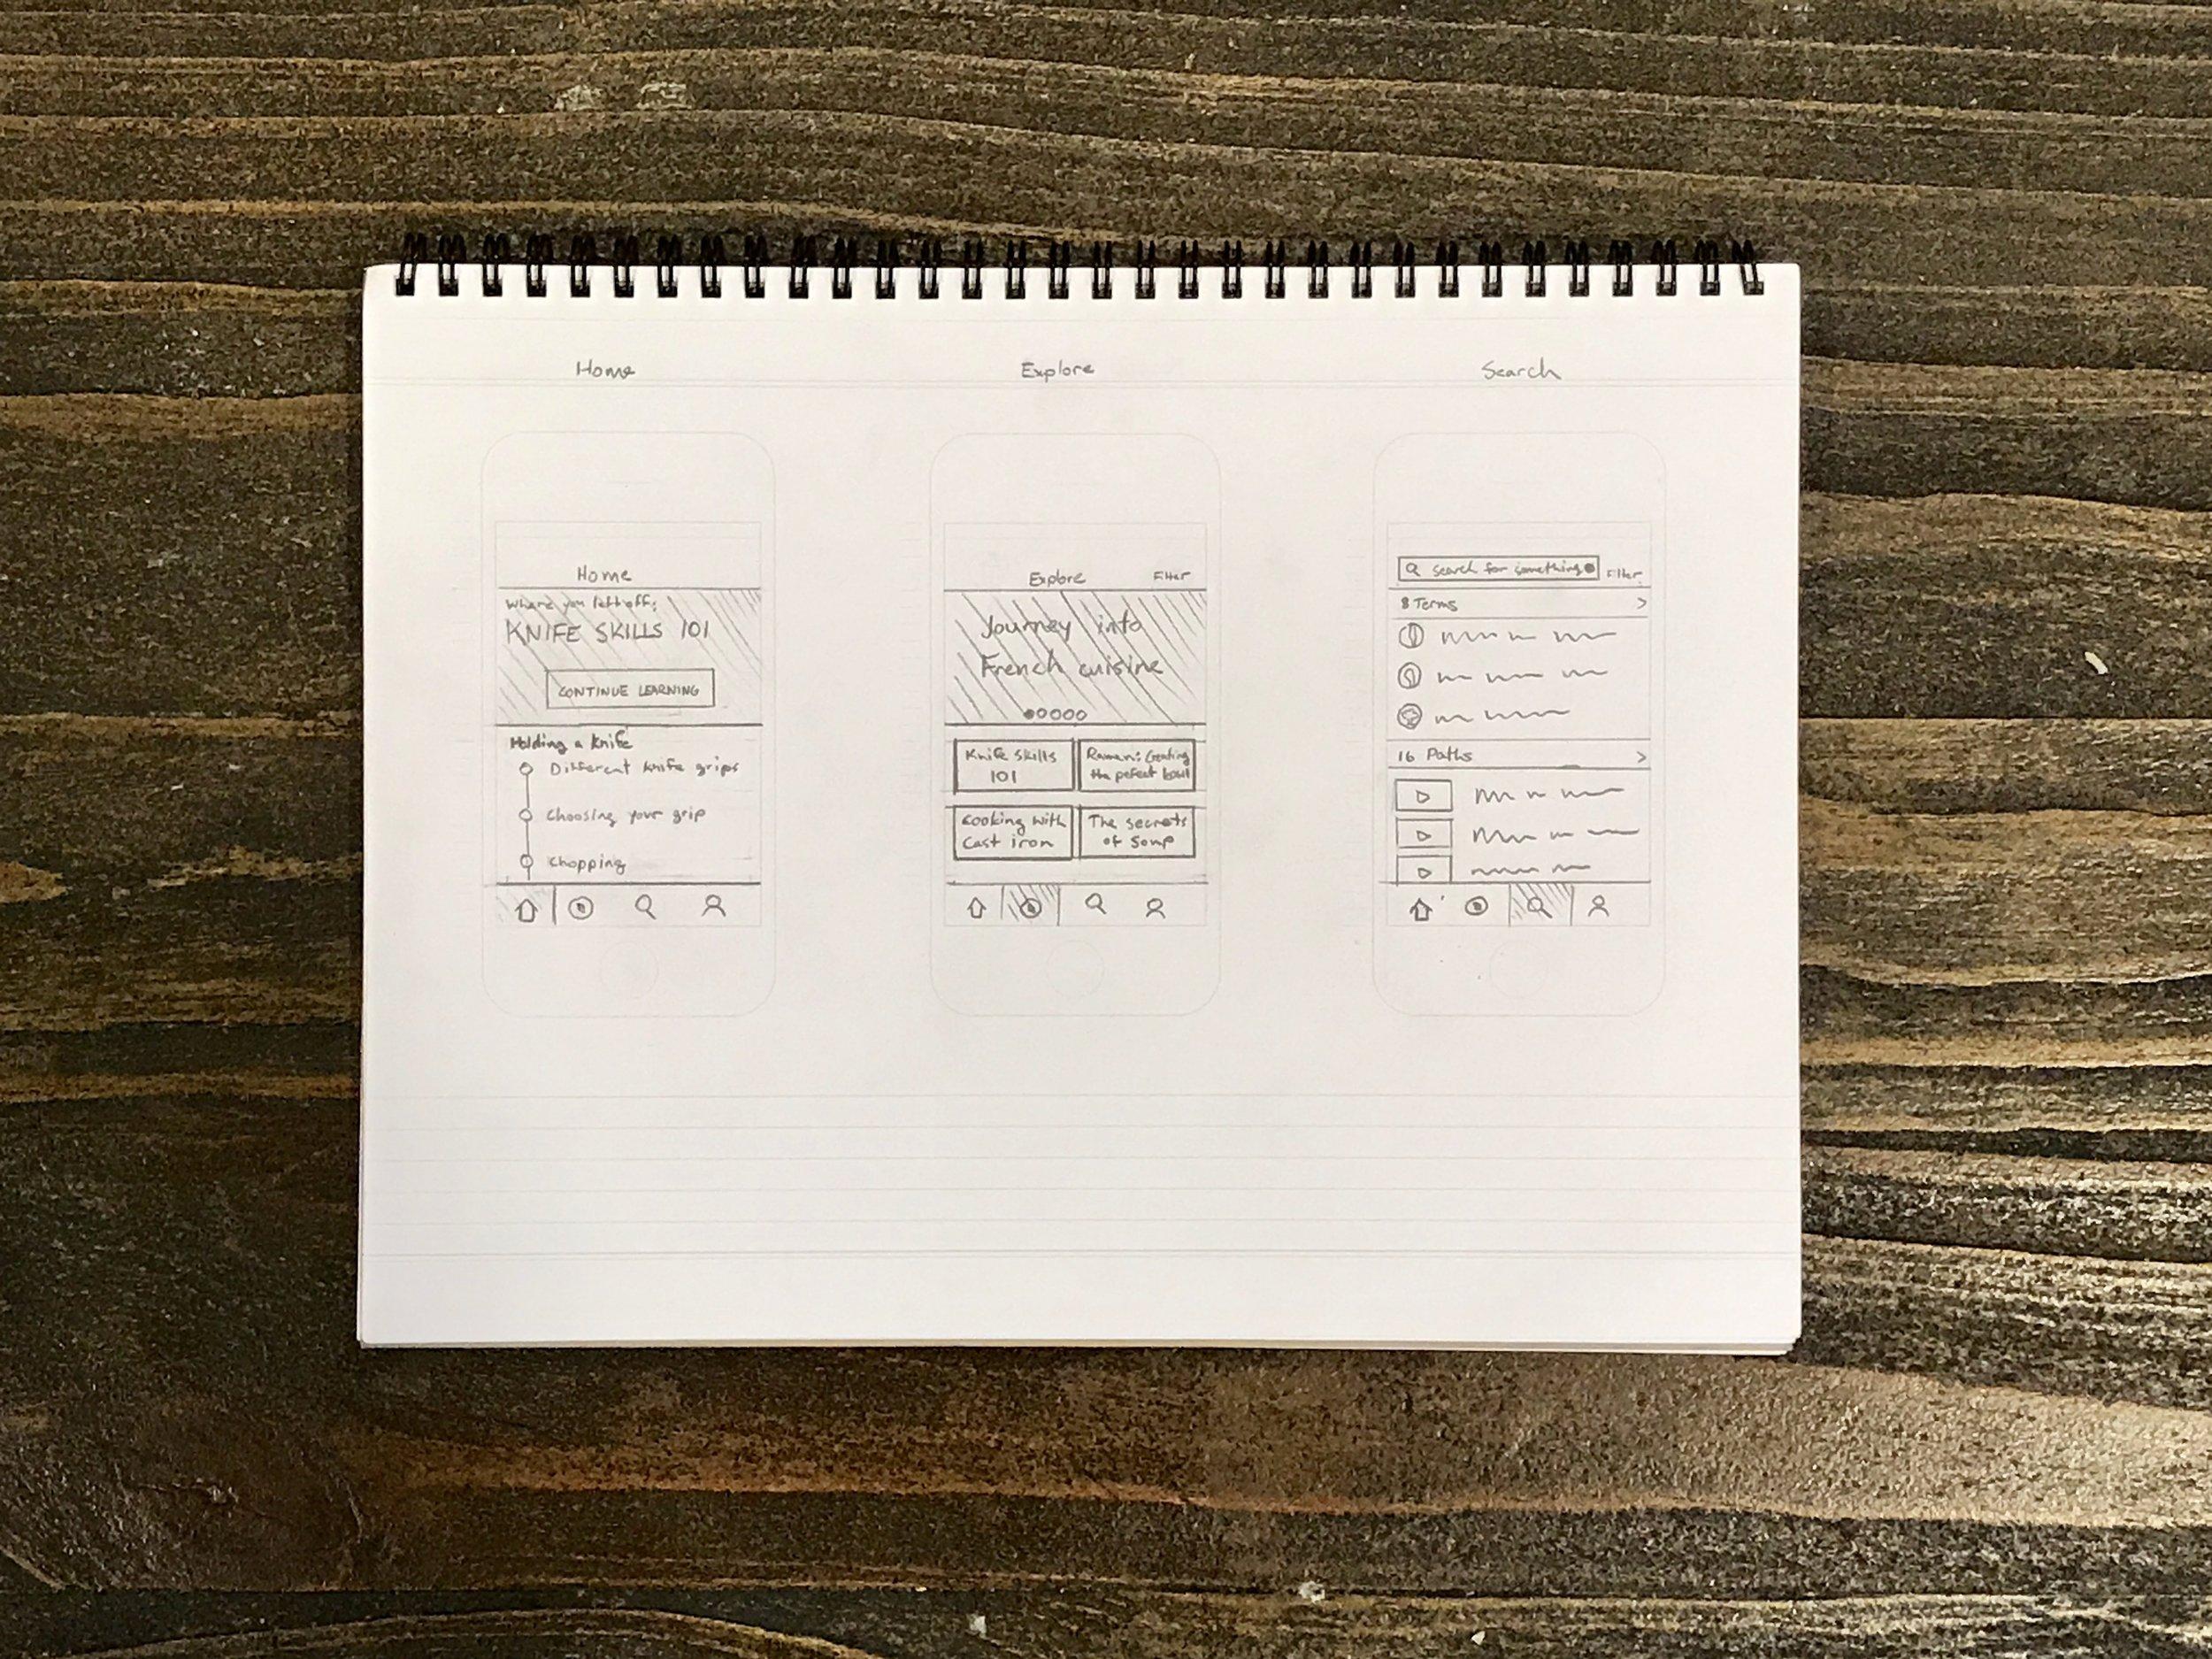 sous_paper-prototype.jpeg